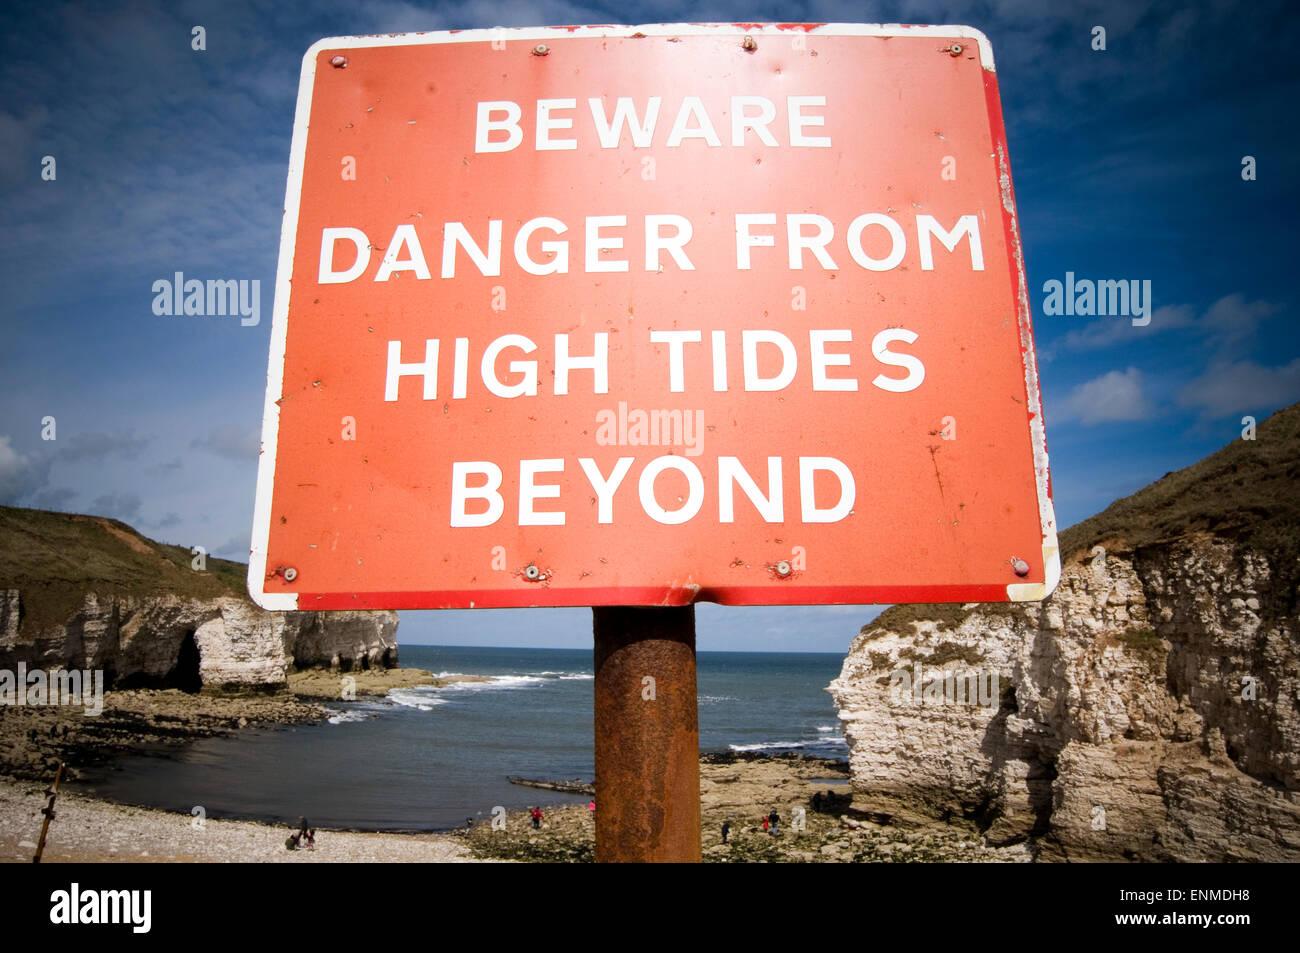 high tide tides sea seas rising levels levels warning global warming climate change flood floods flooding extreme - Stock Image